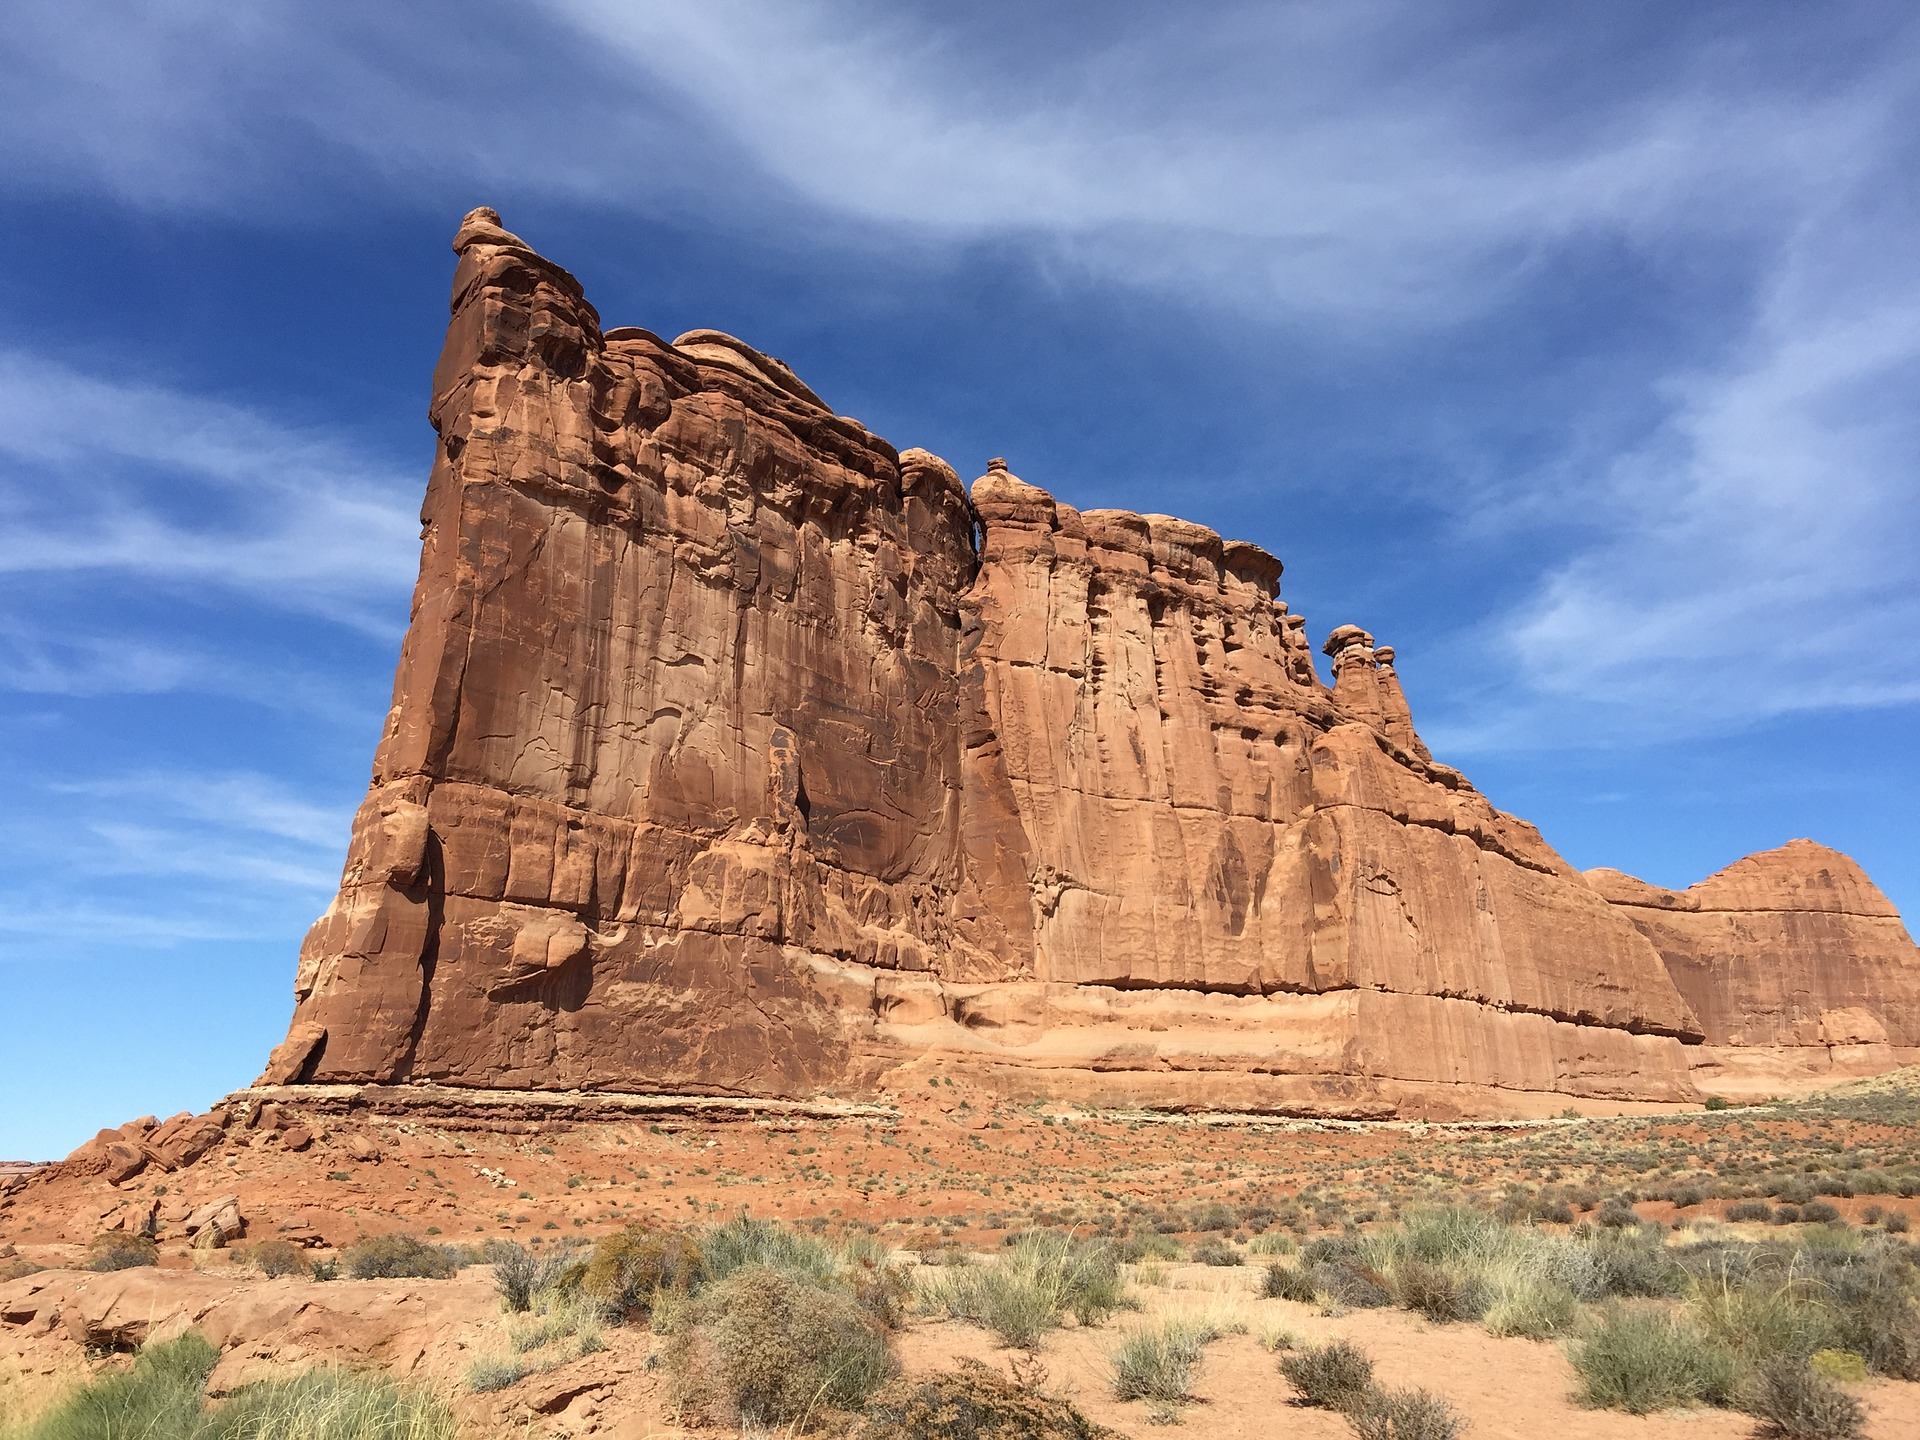 arches-national-park-2646472_1920.jpg